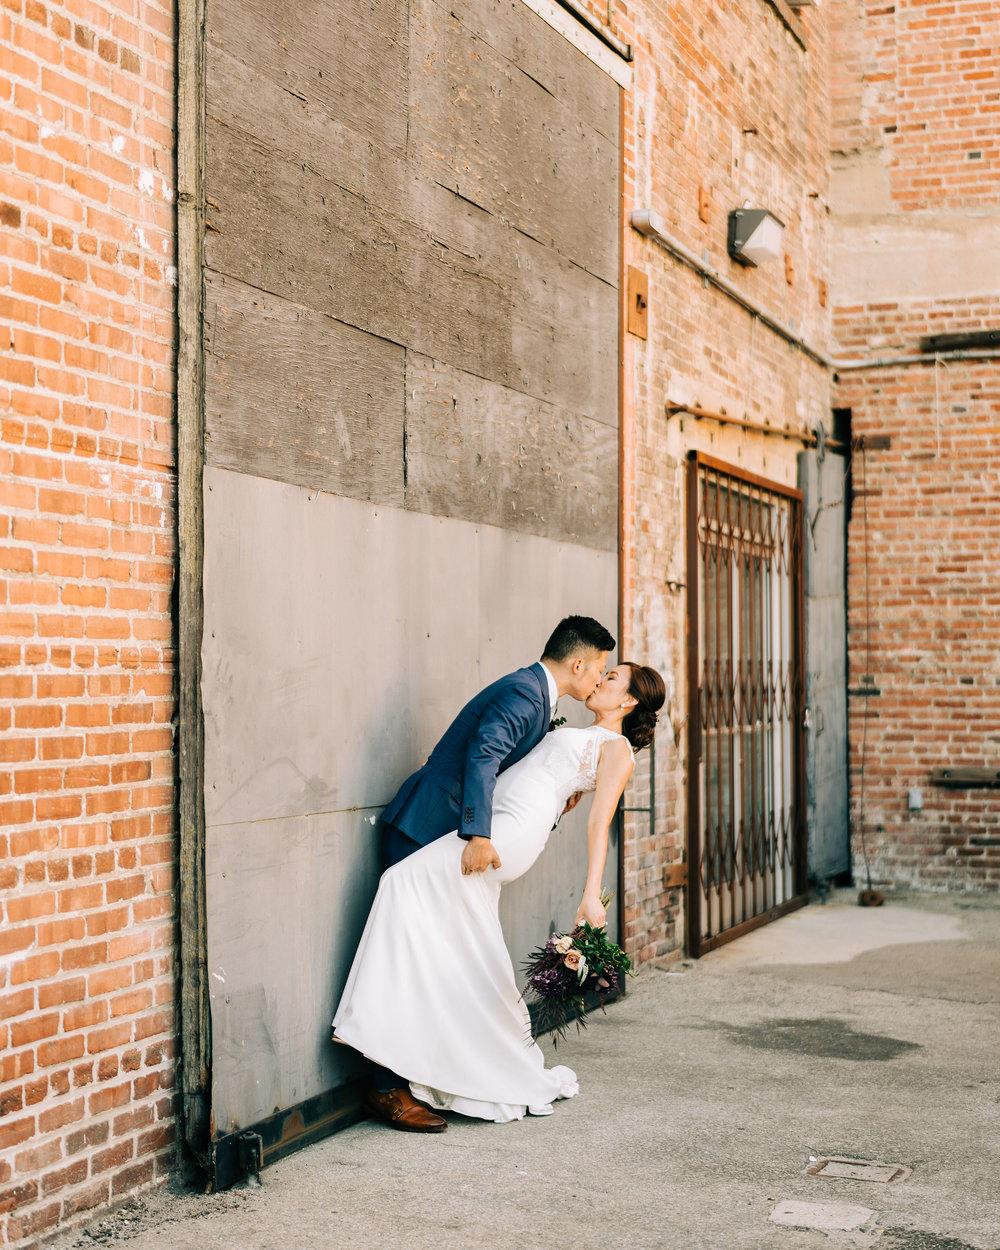 the-alley-at-daily-dose-wedding-brandon-bibbins-photography-0 (2).jpg